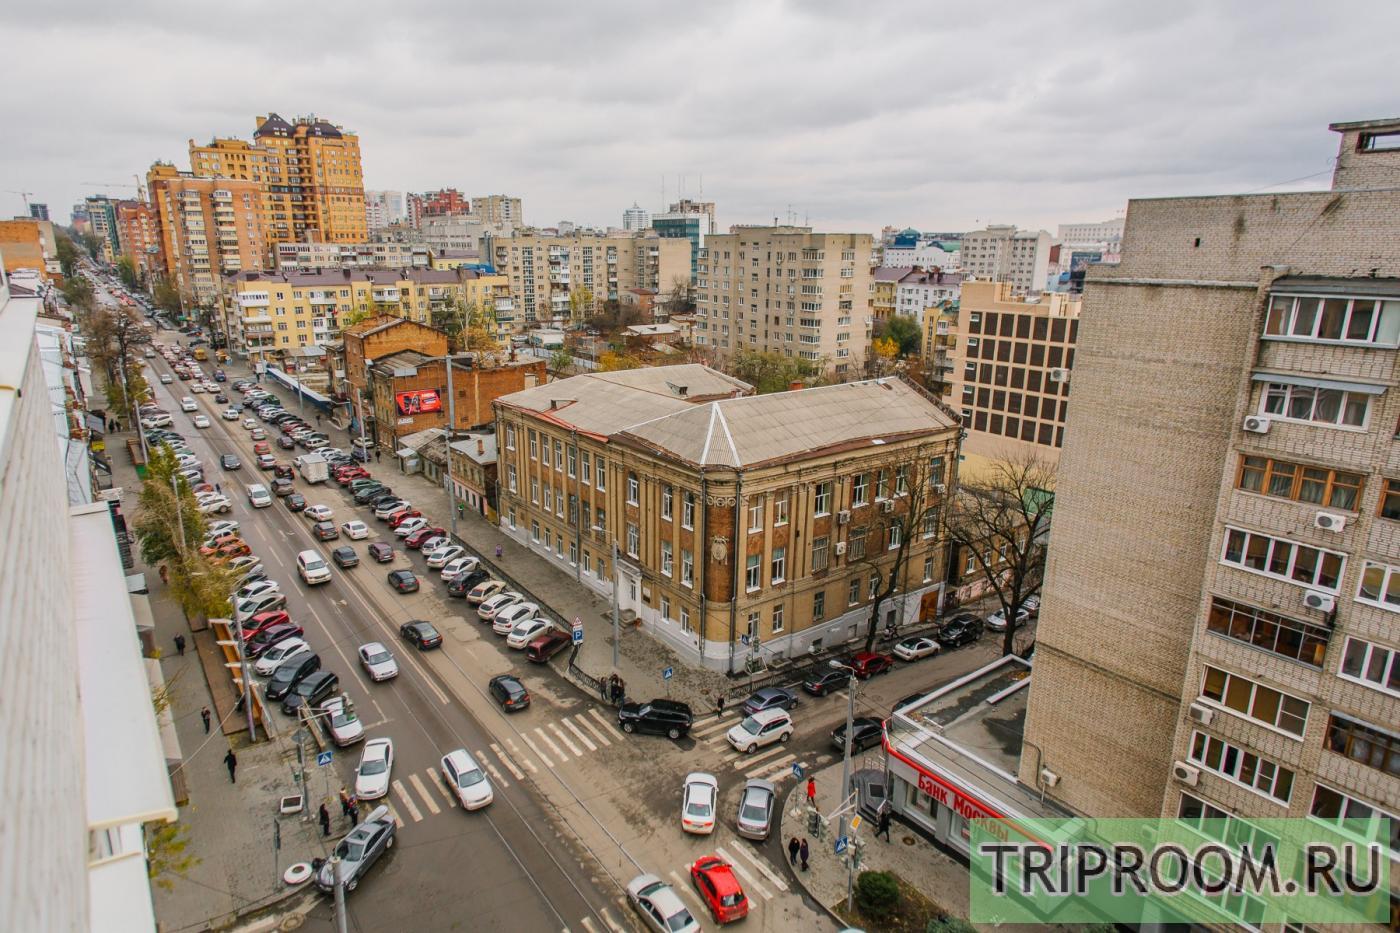 2-комнатная квартира посуточно (вариант № 23730), ул. Максима Горького улица, фото № 23